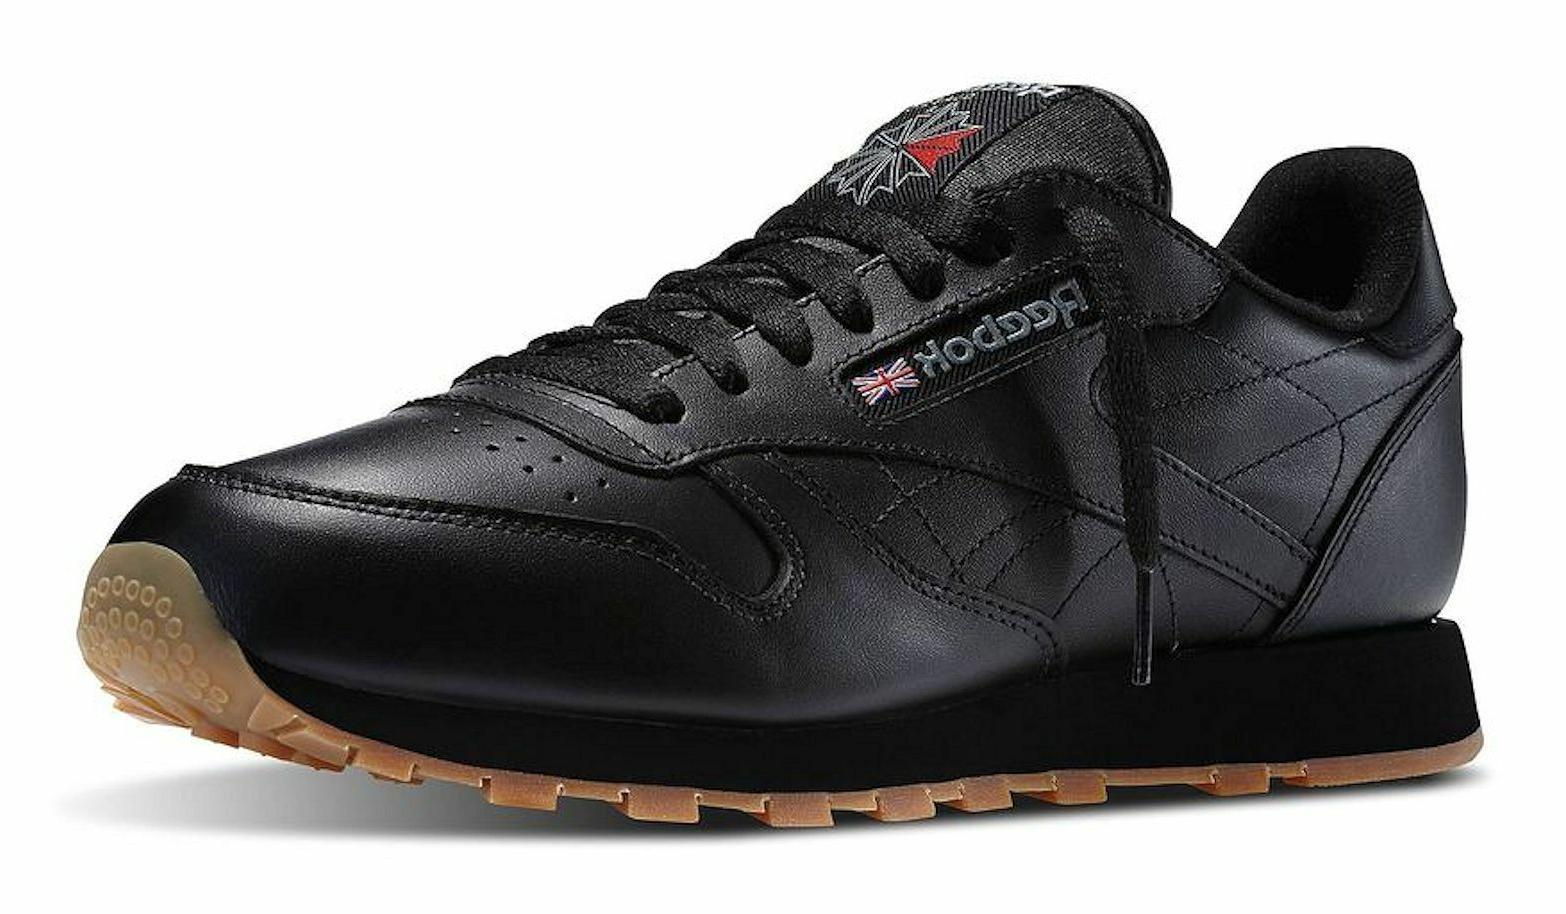 fe769801646 Reebok Classic Leather Black